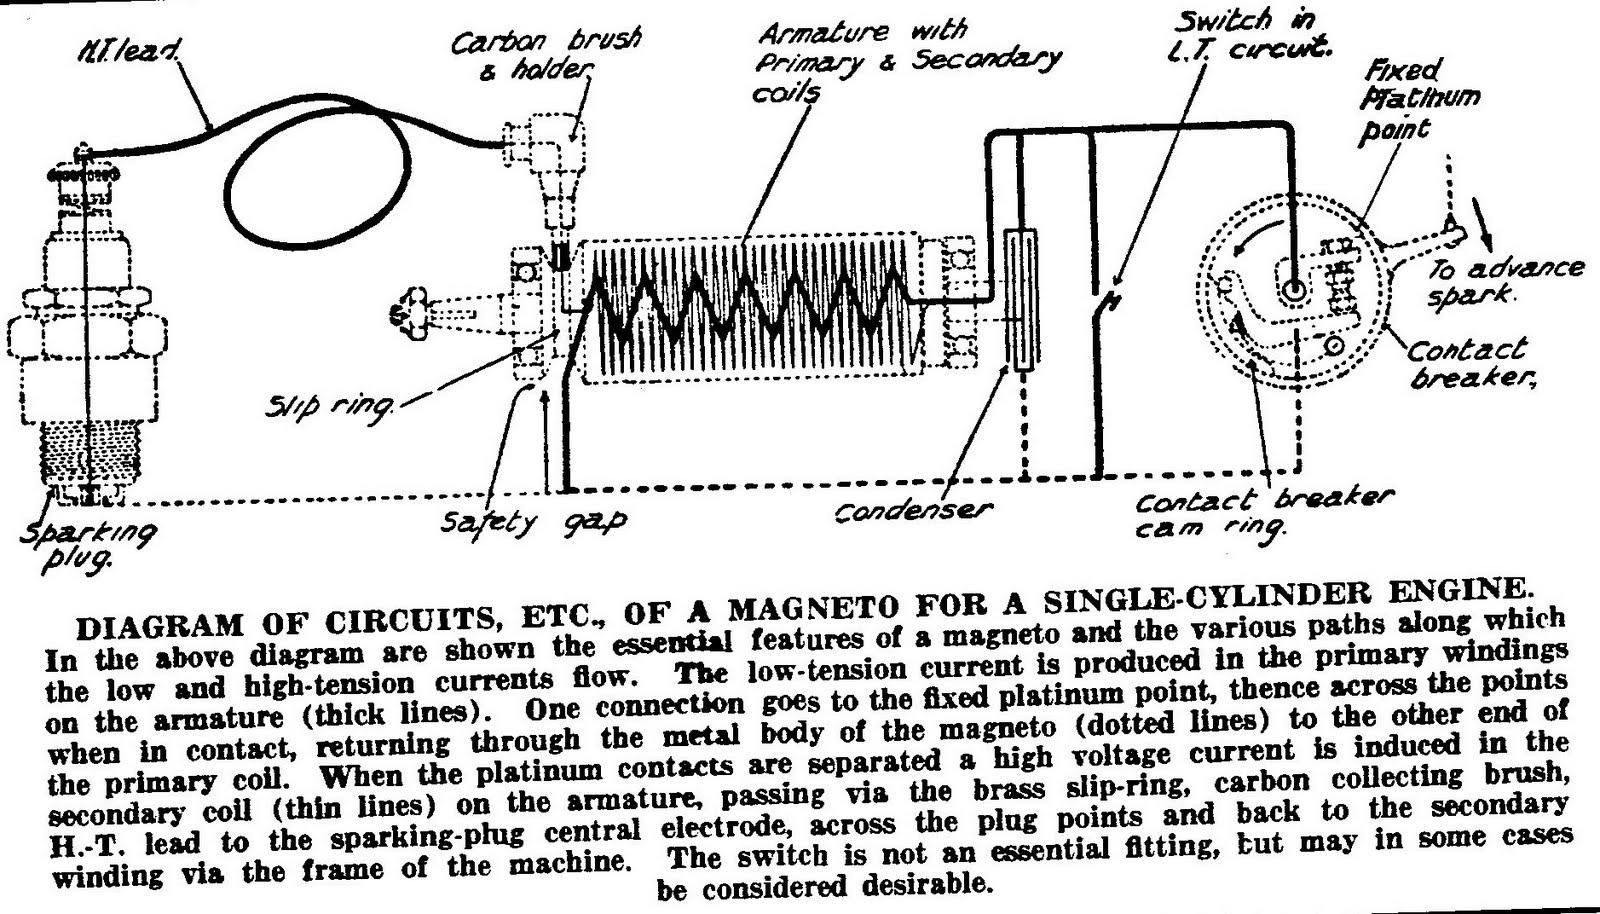 medium resolution of magneto wiring 25cc schematic wiring library john deere wiring schematic magneto wiring 25cc schematic